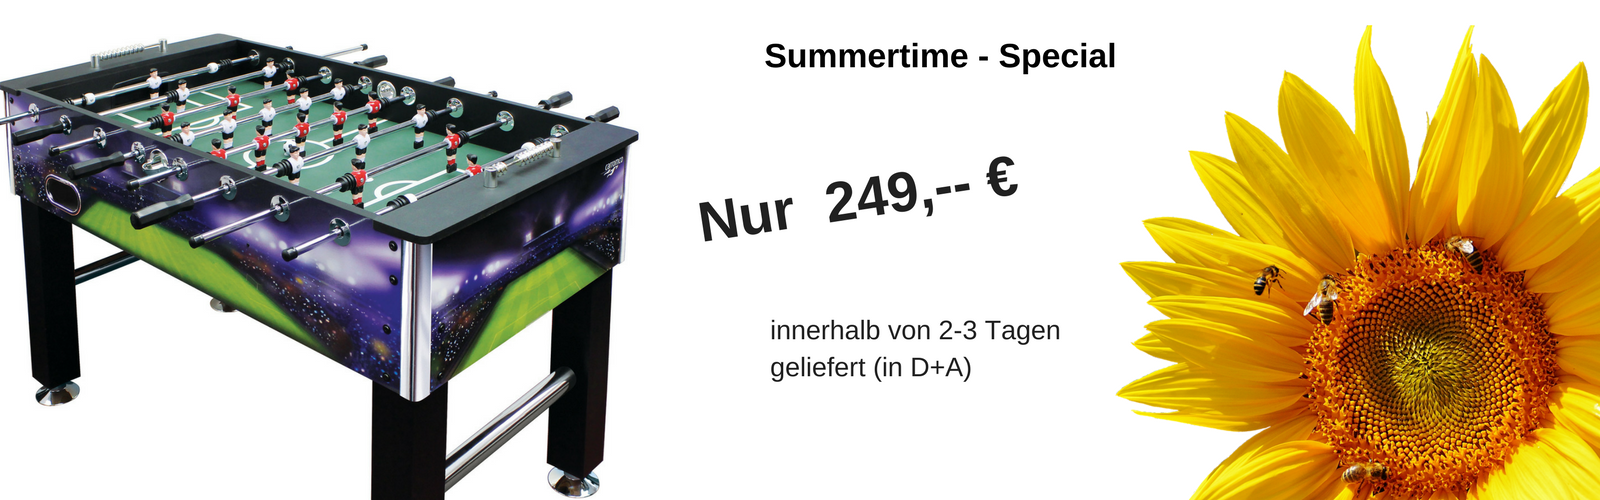 Kickerland Arena Summer Special